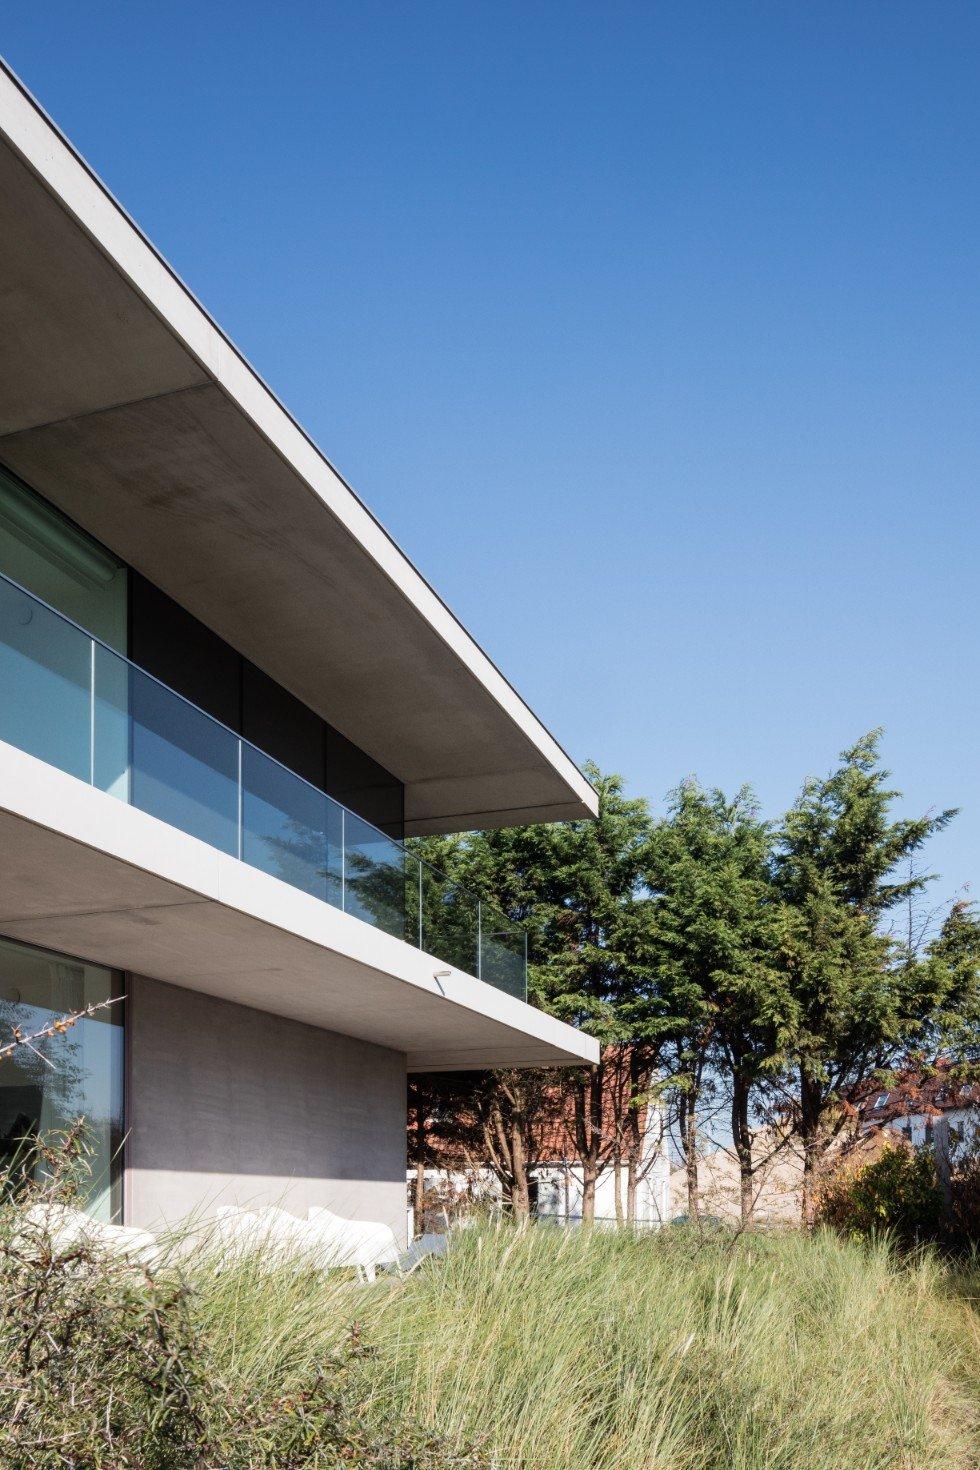 Rietveldprojects.be-Twins-Gropius-Breuer-appartement-design-architectuur-kust6